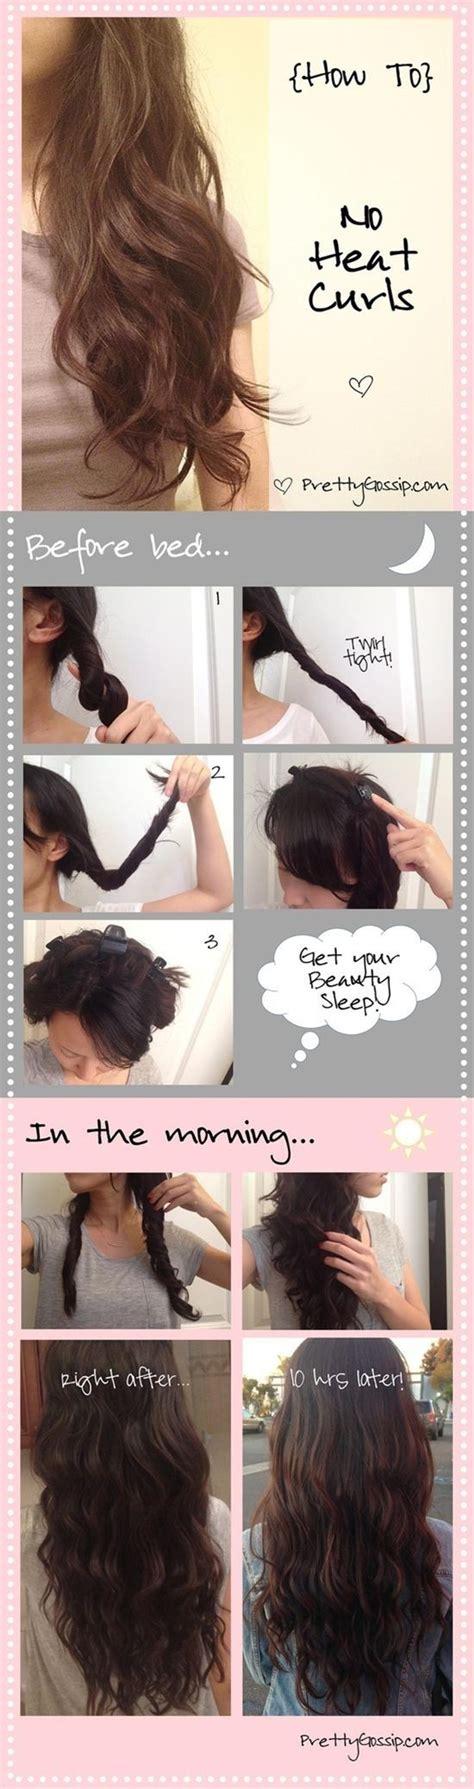 step by step tutorial on seeing curly weave no heat curls 12 ways to get heatless curls